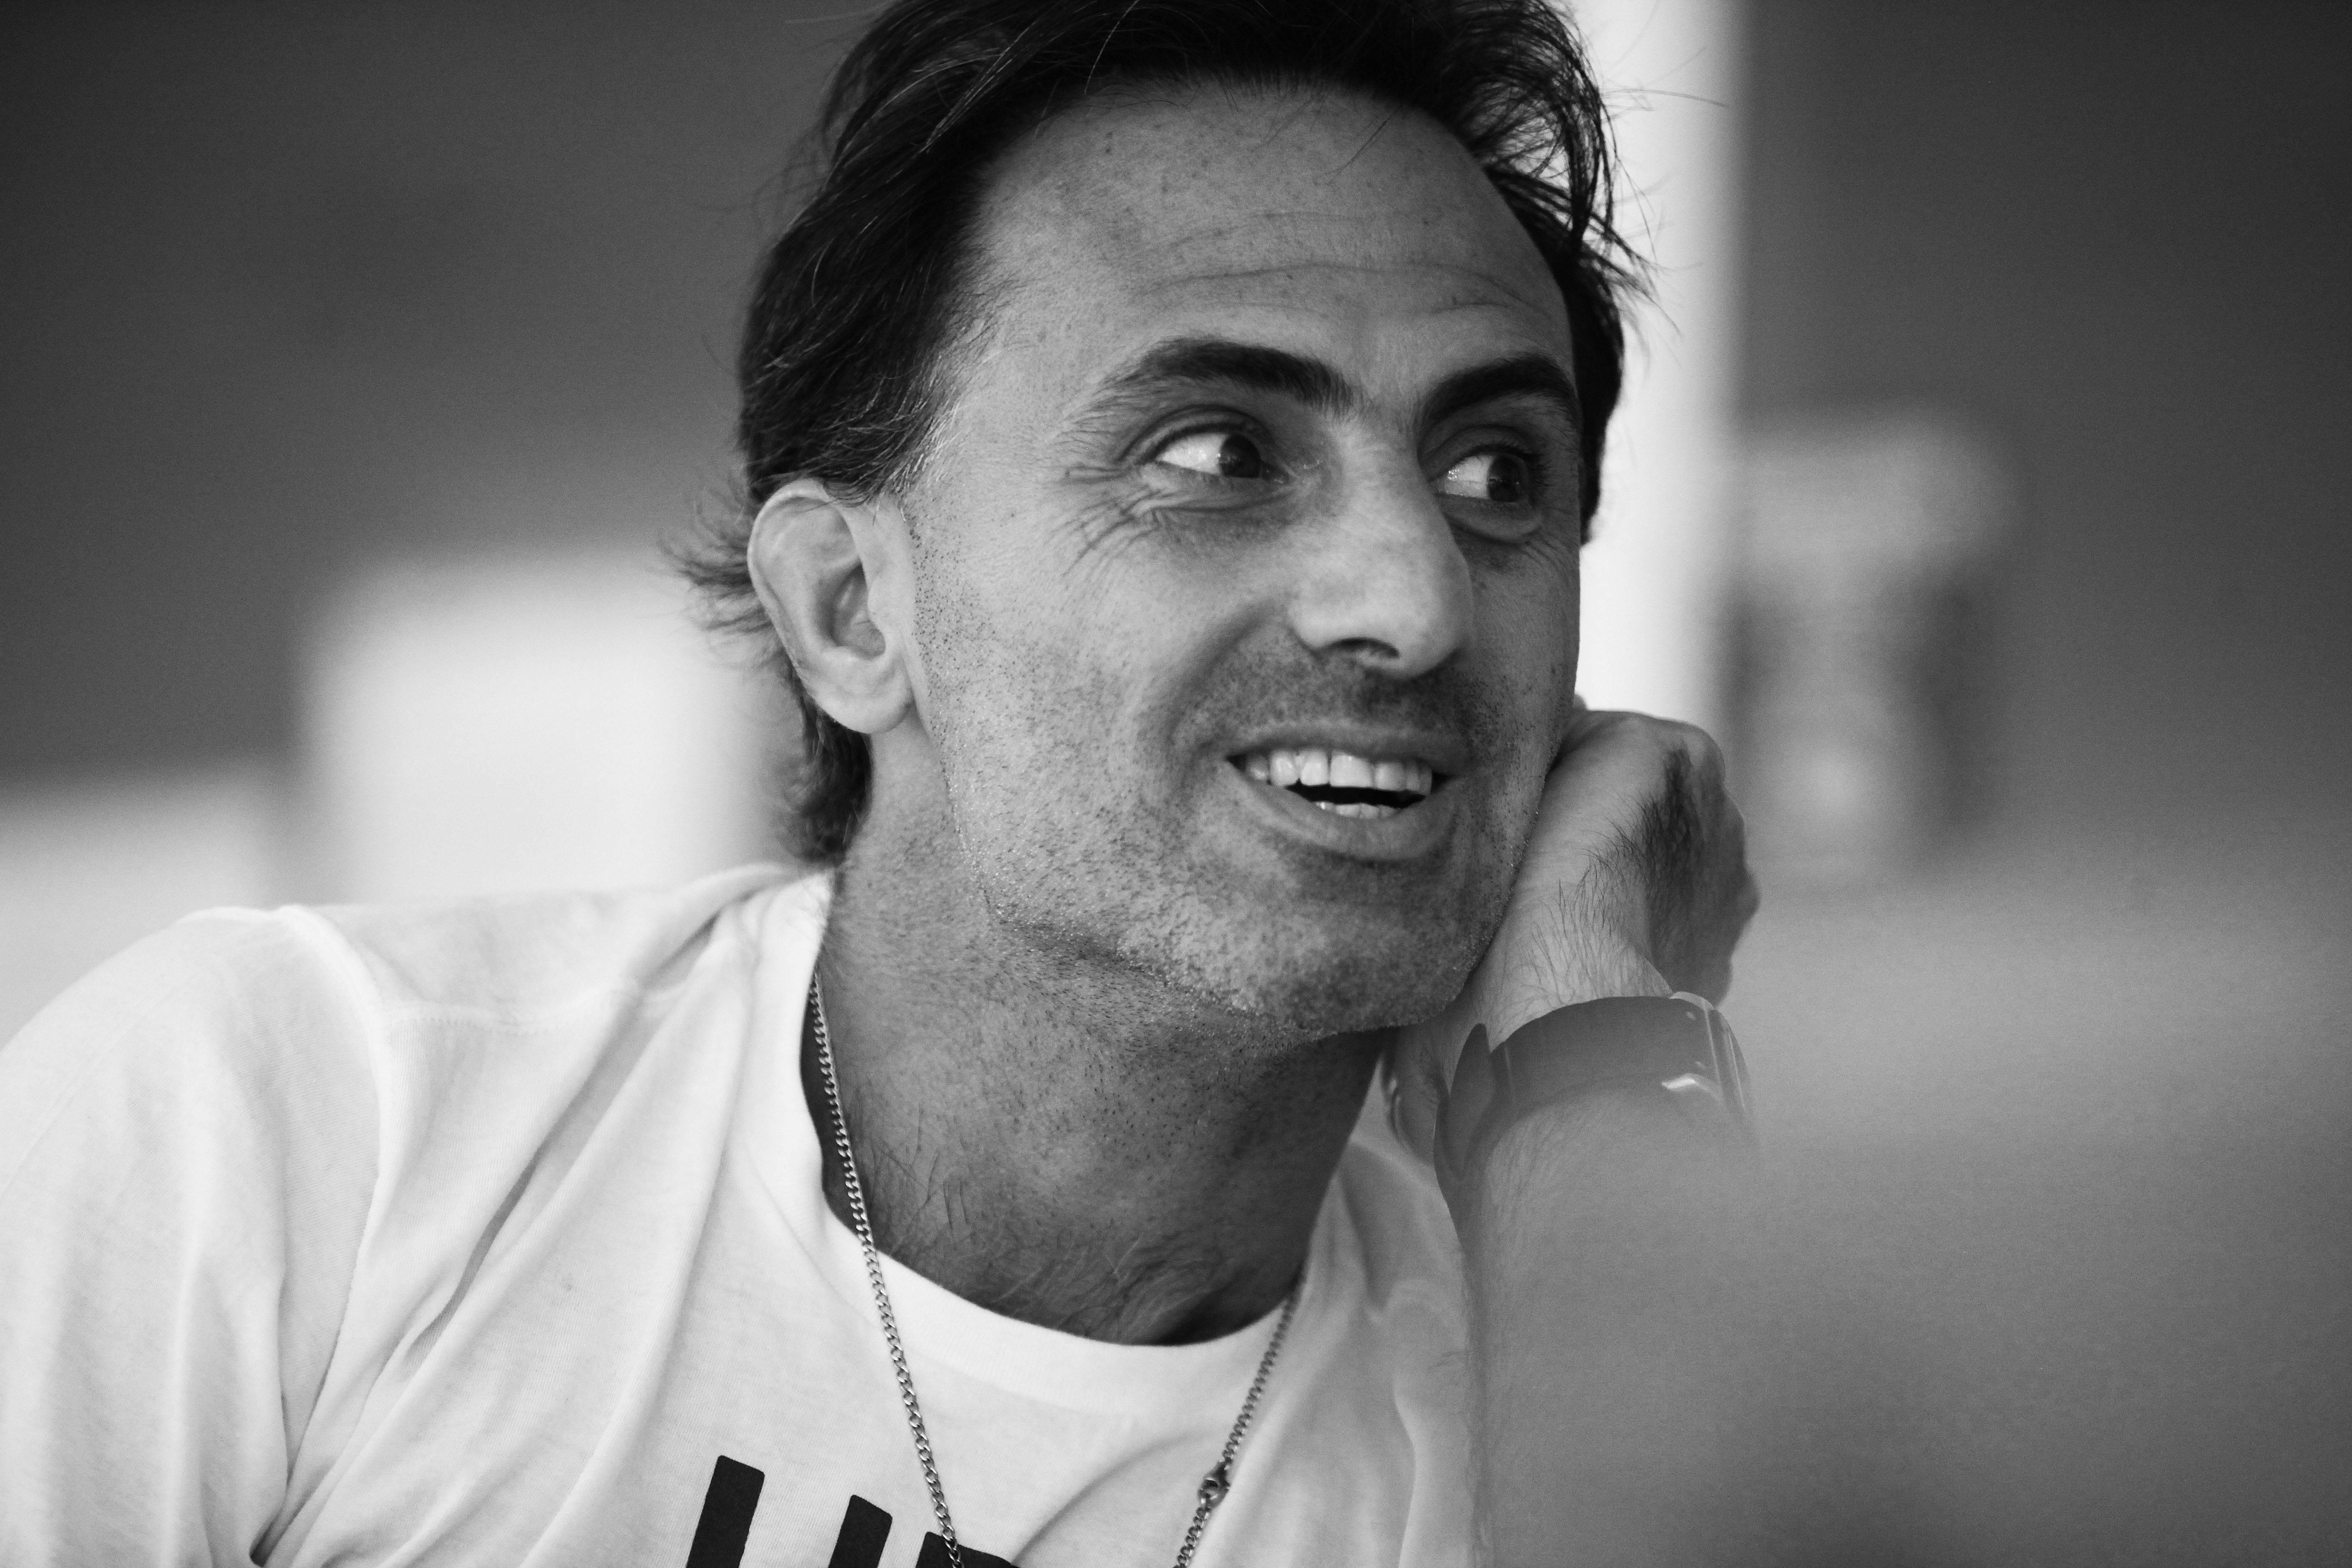 Diego Latorre, ex-futbolista y comentarista argentino